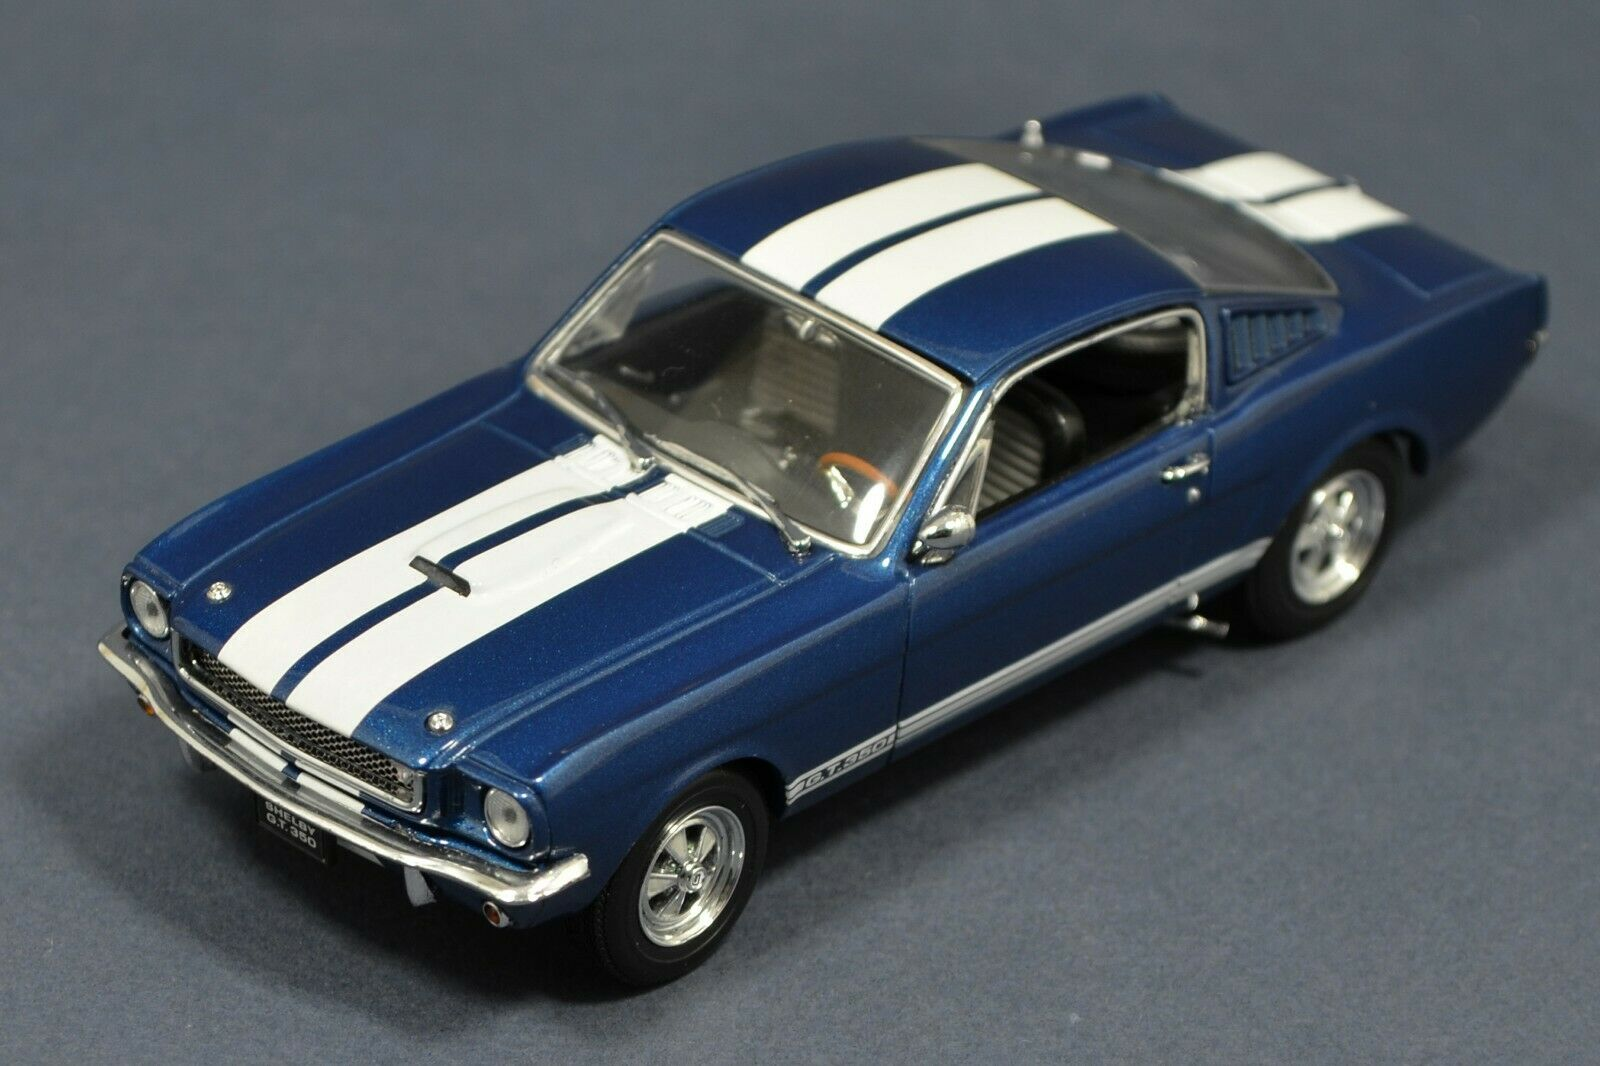 1 43 Shelby GT350 1965 Blau & Weiß stripes Kyosho 03121B IN BOX GT 350 Mustang